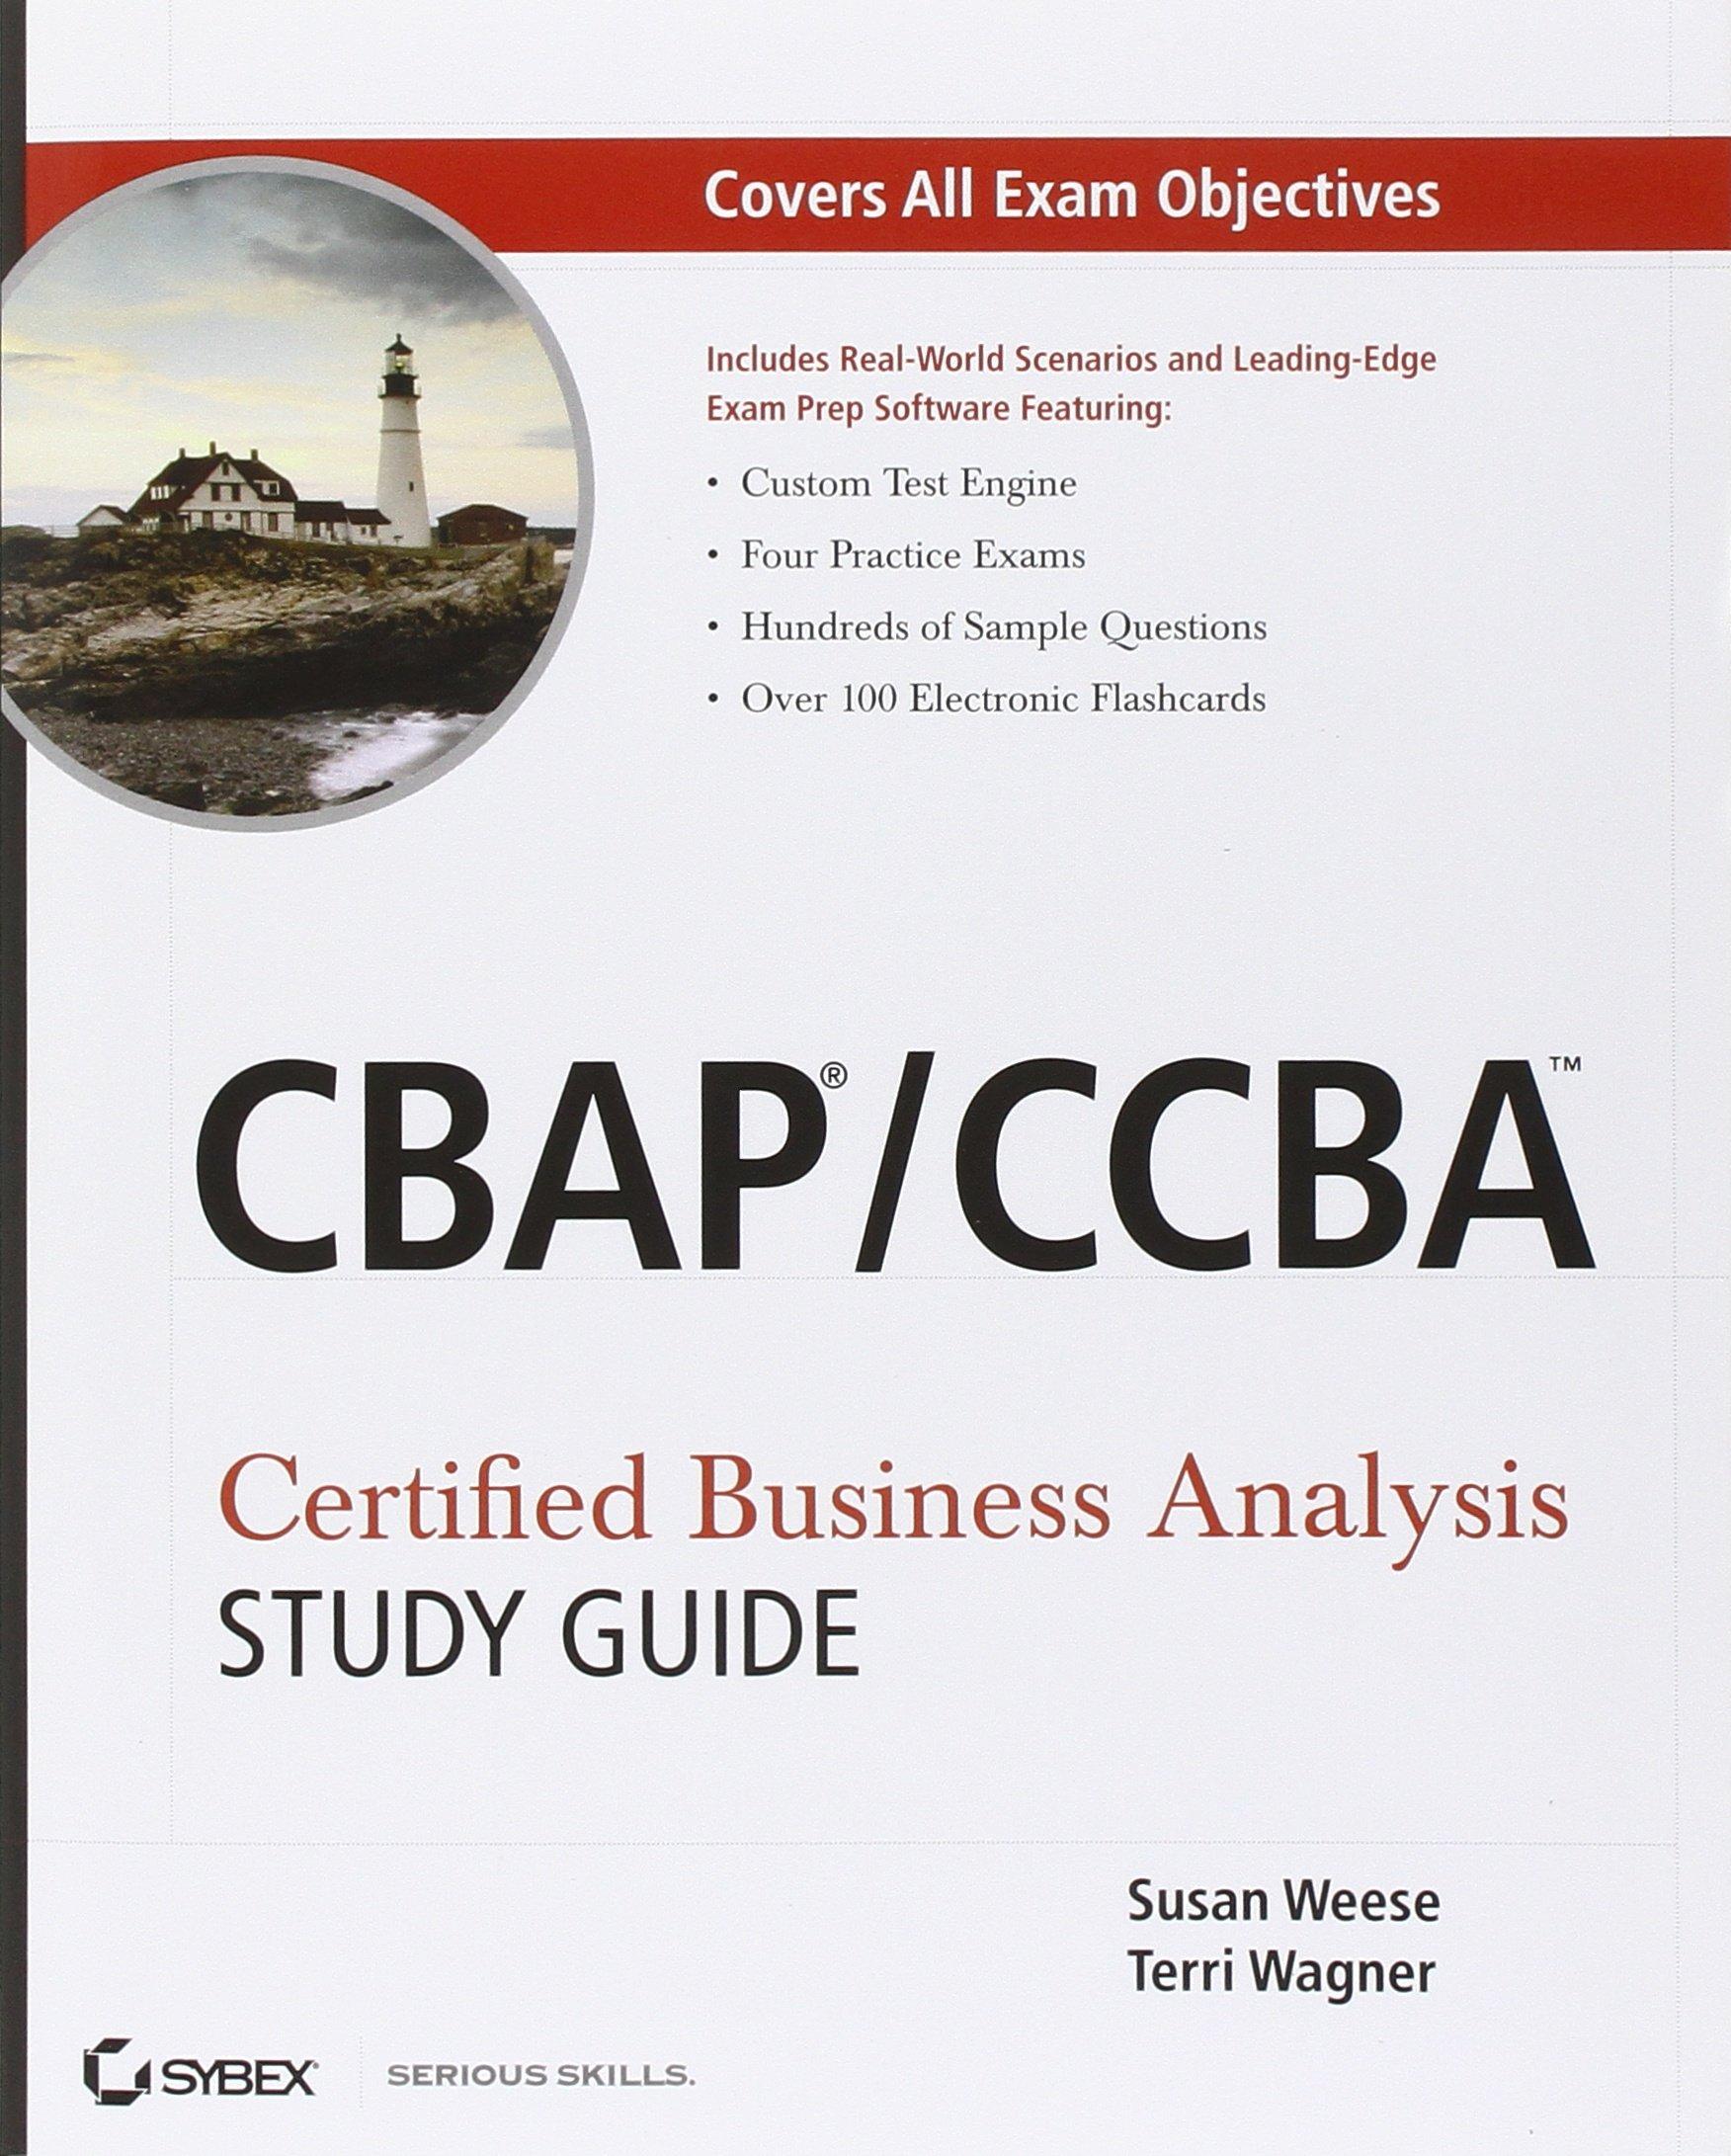 Cbapccba Certified Business Analysis Study Guide Amazon Susan